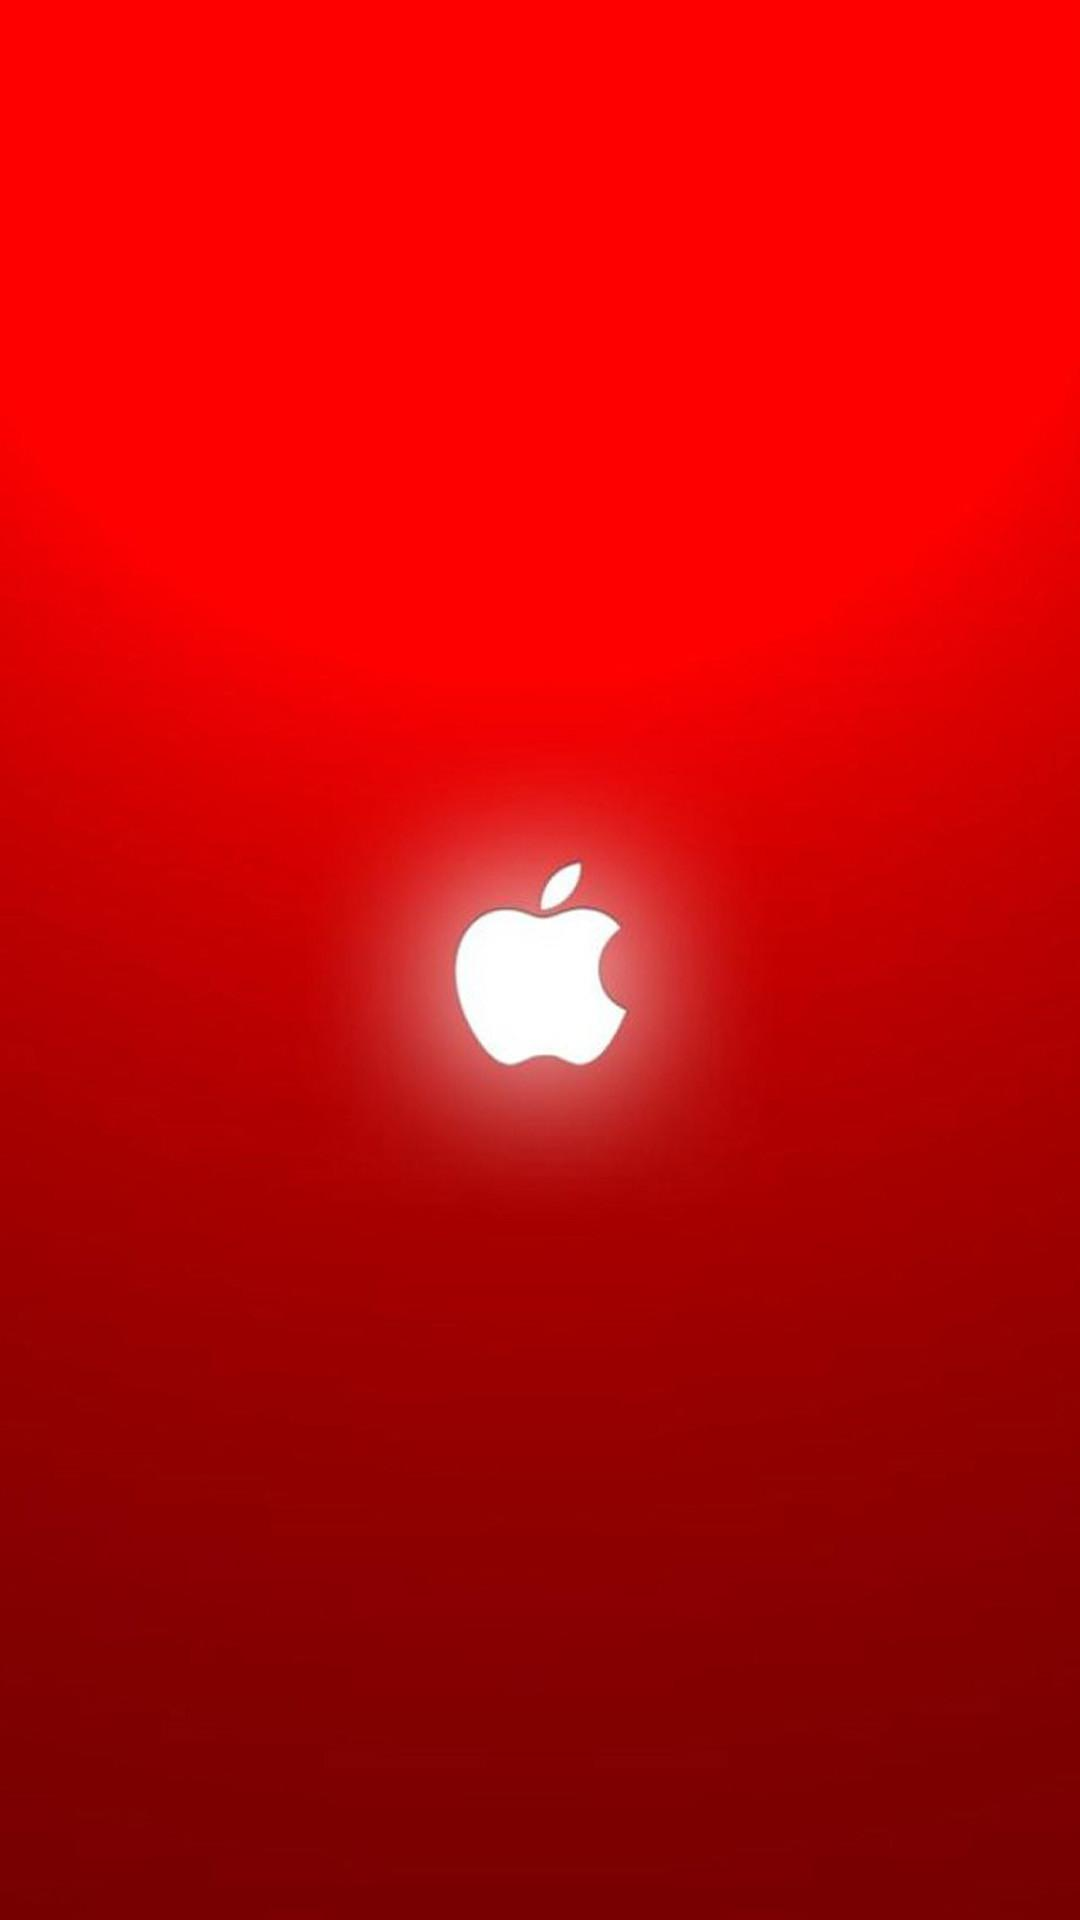 Apple 4k Iphone X Wallpapers Wallpaper Cave